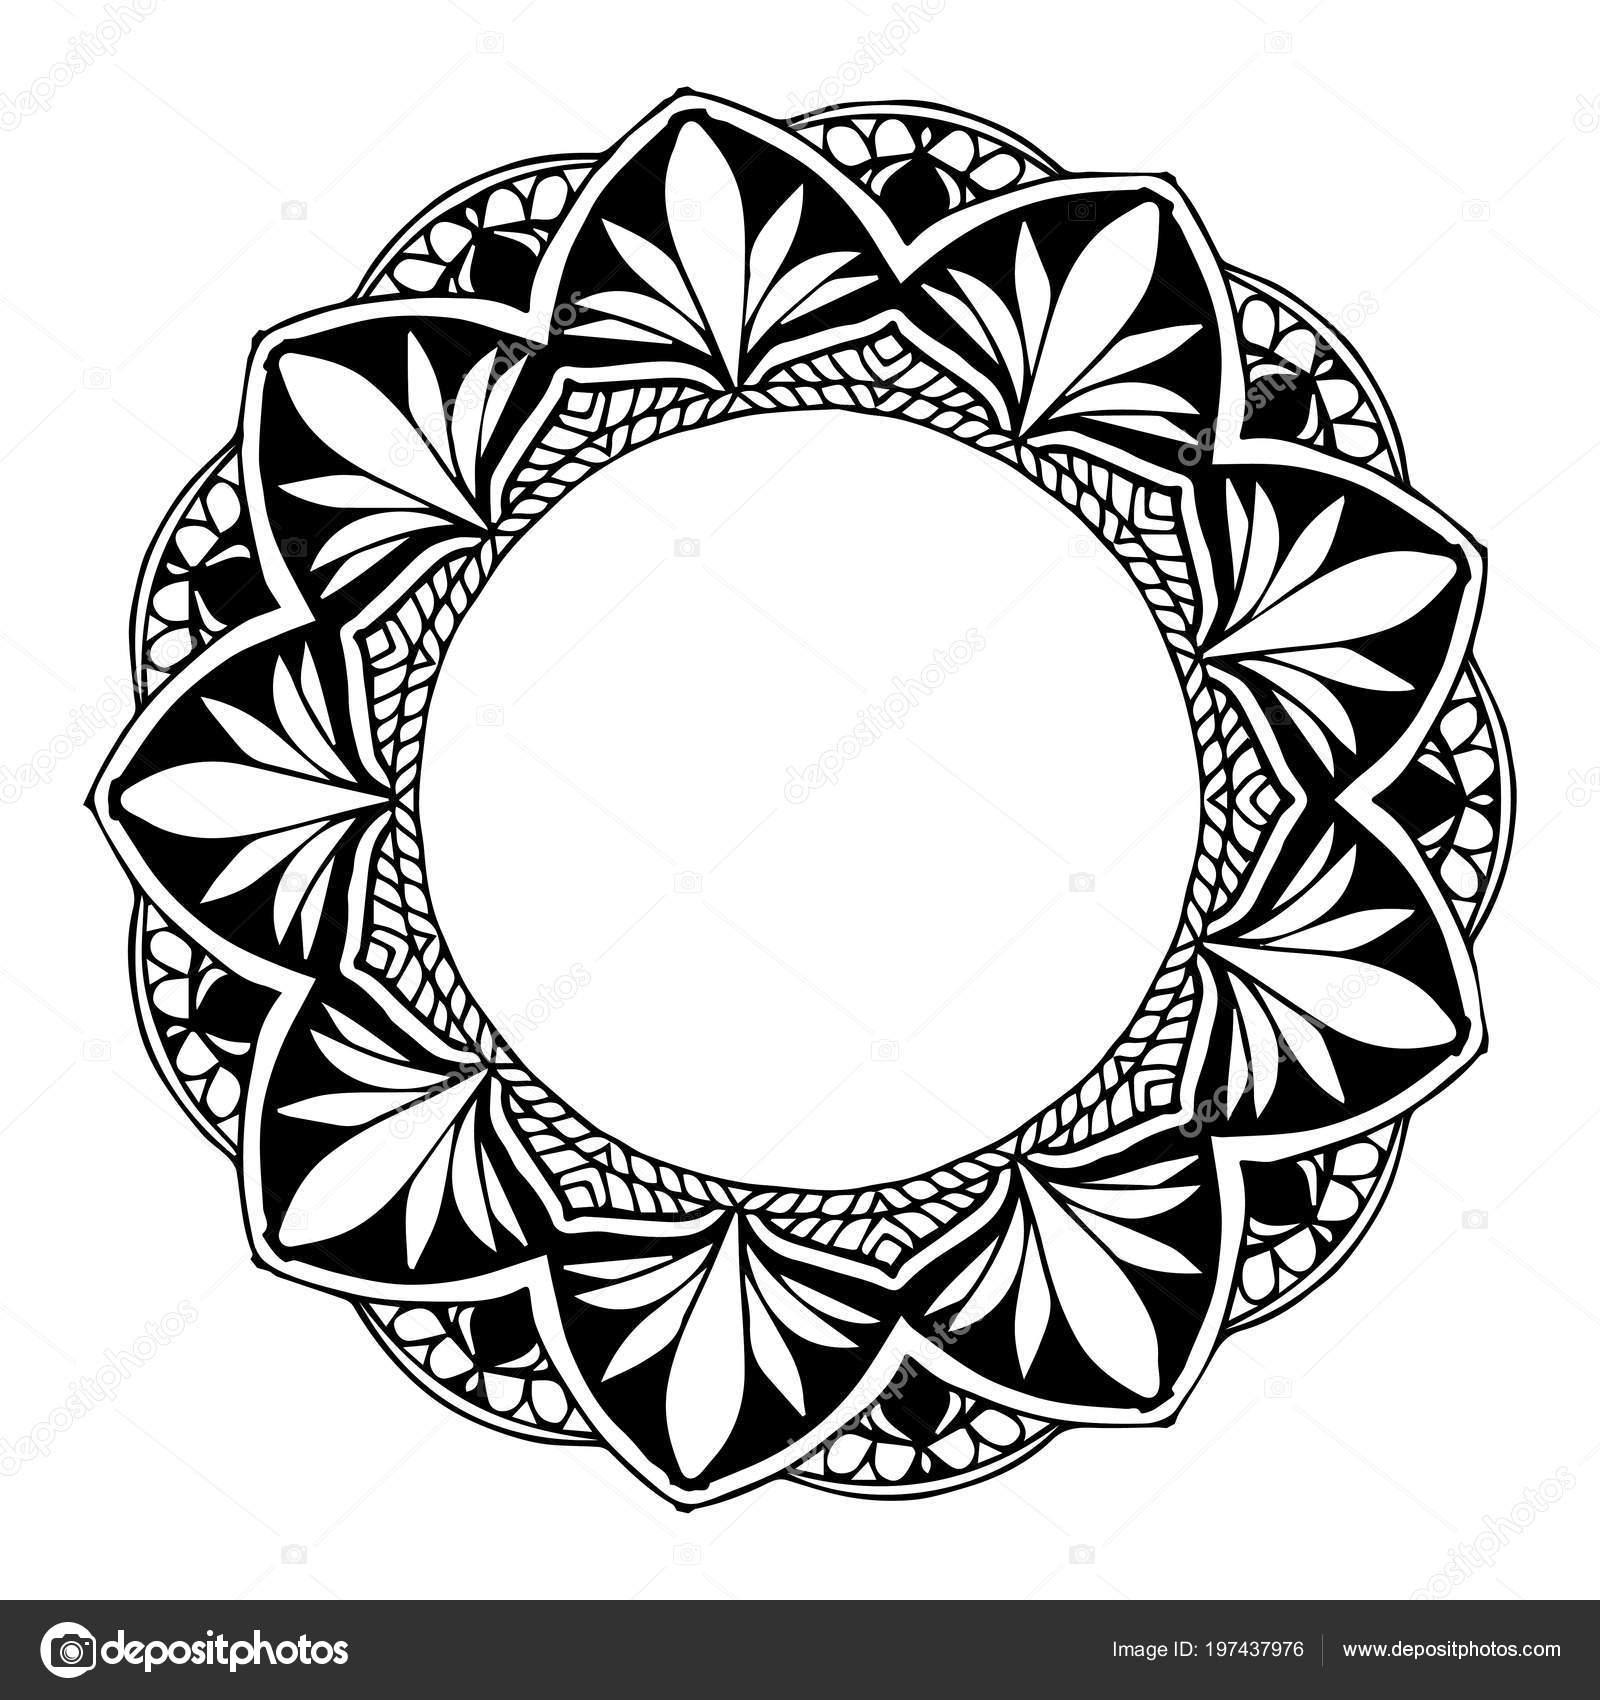 Mandalas Coloring Book Decorative Ornaments Unusual Flower Shape Oriental Vector